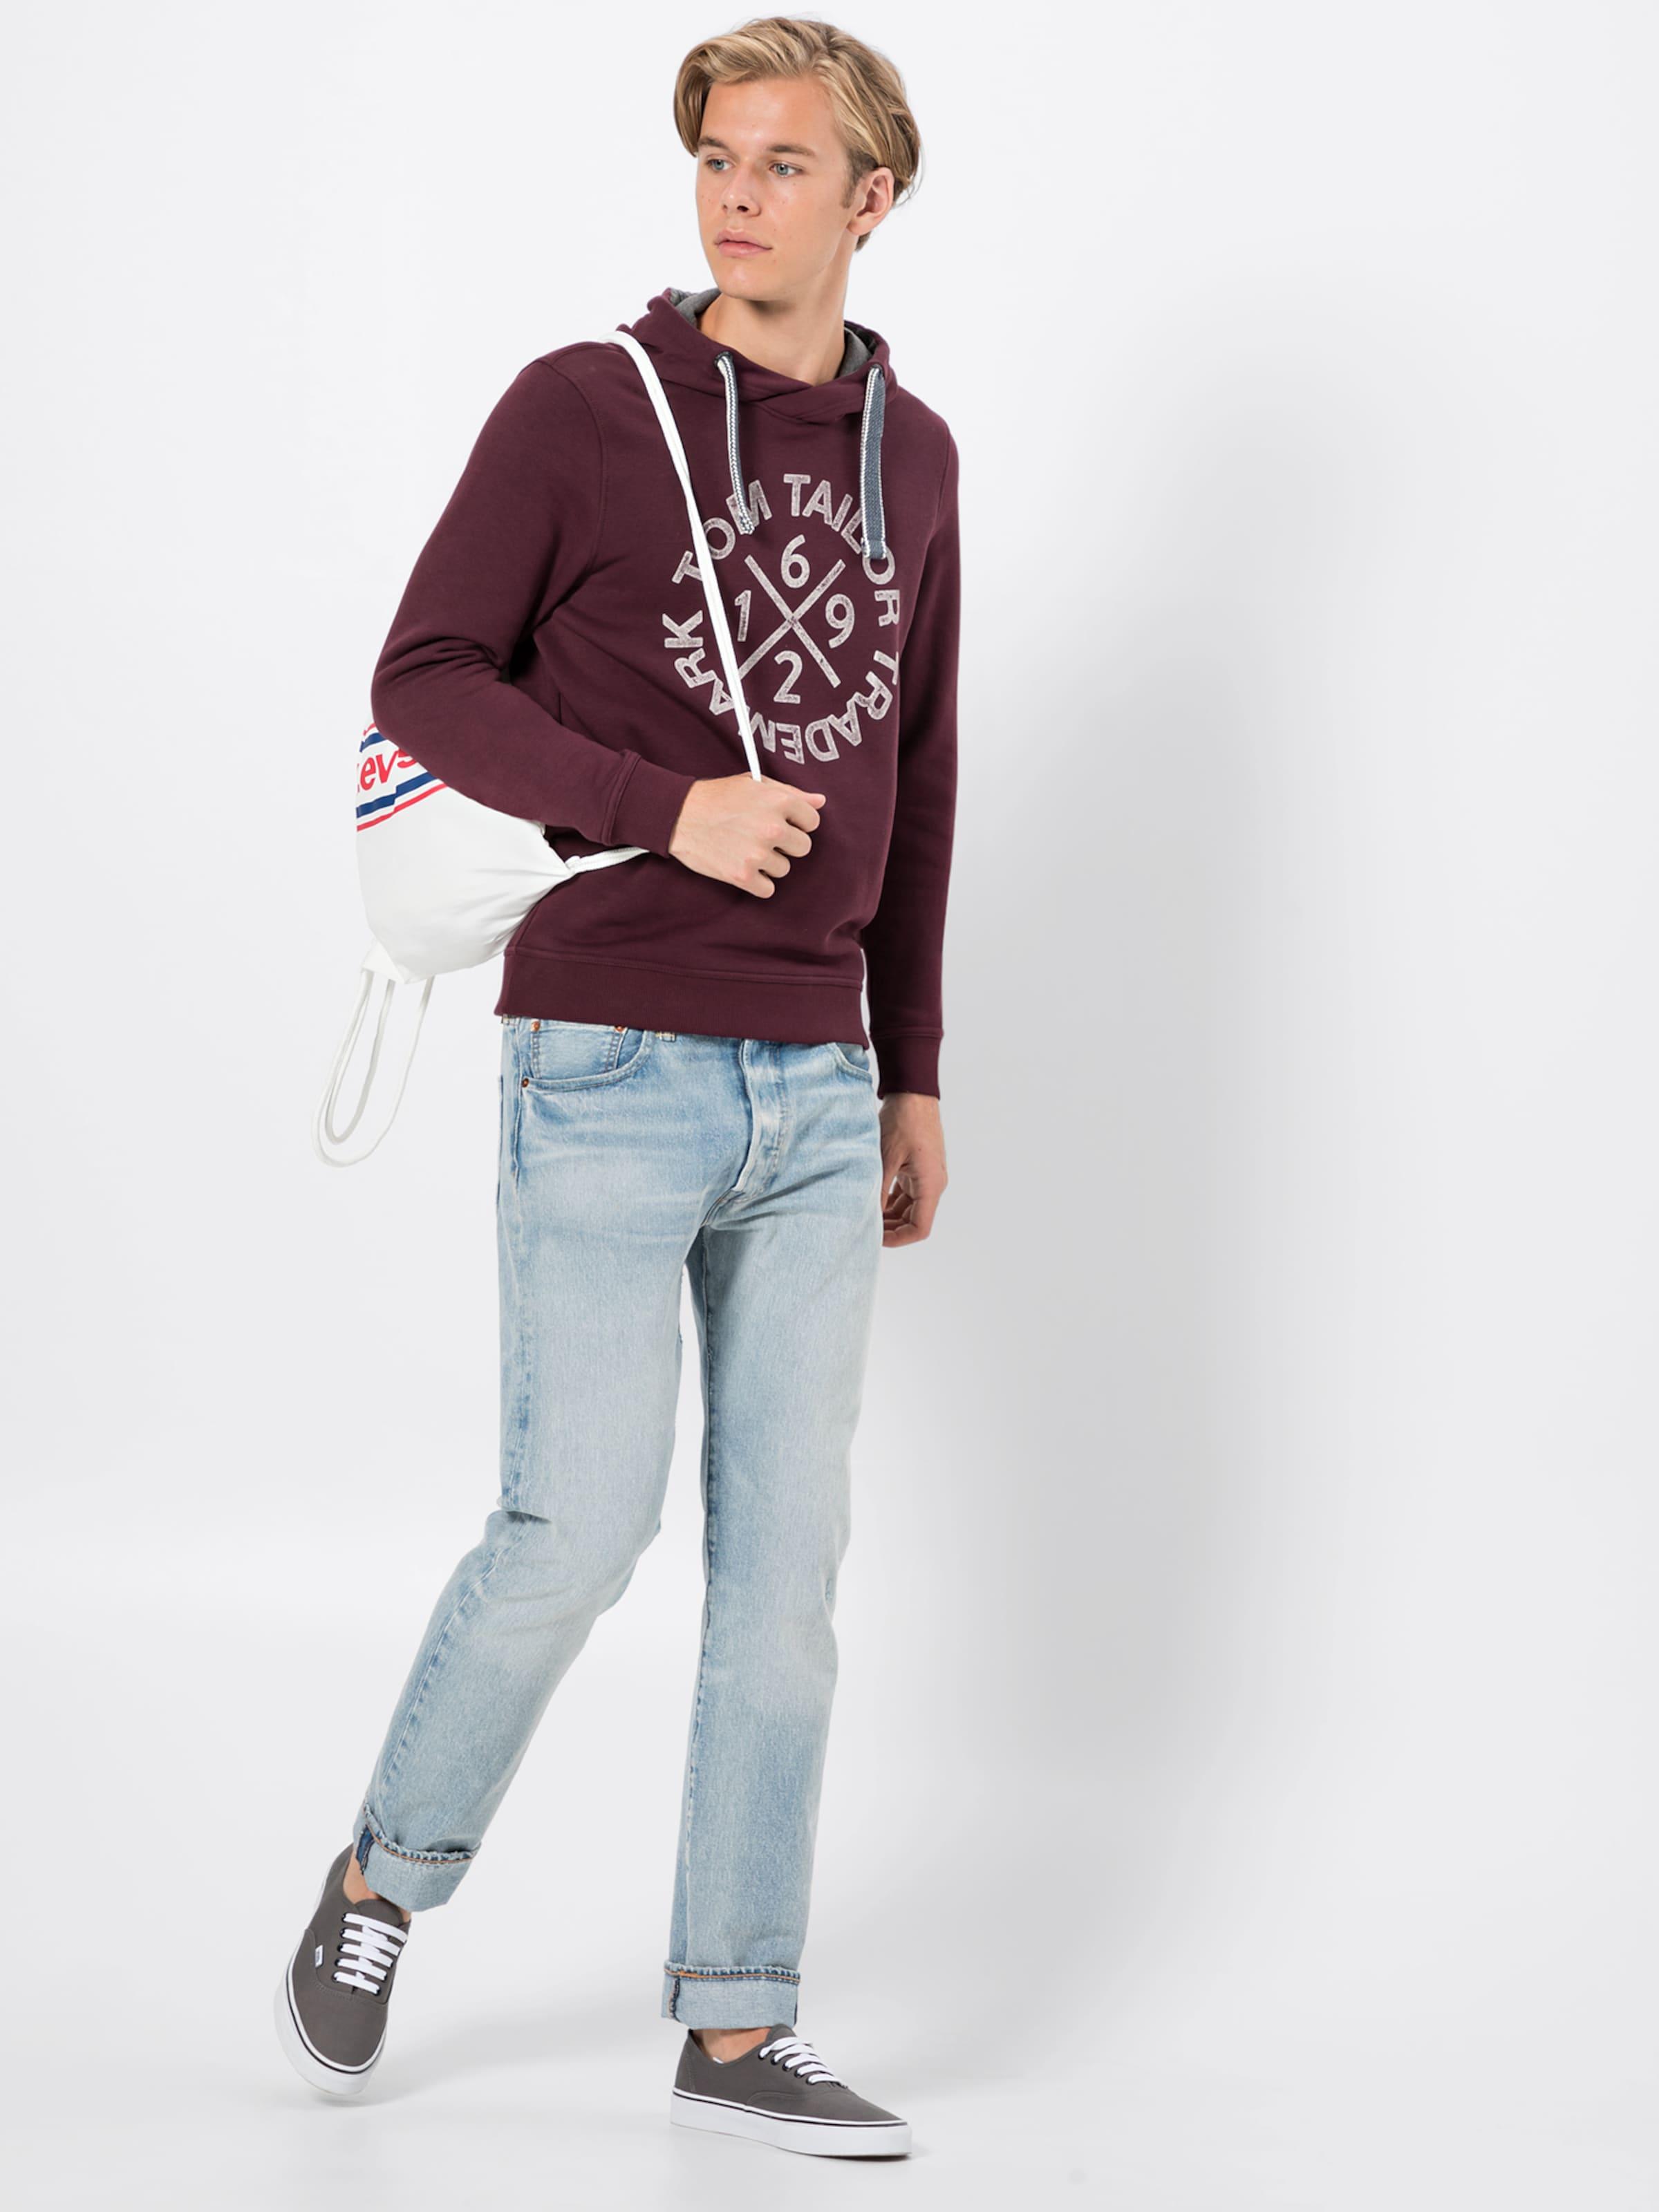 Blanc Tom DenimPourpre shirt En Bleu 'print Hoodie' Sweat Tailor hxQBtrCsd